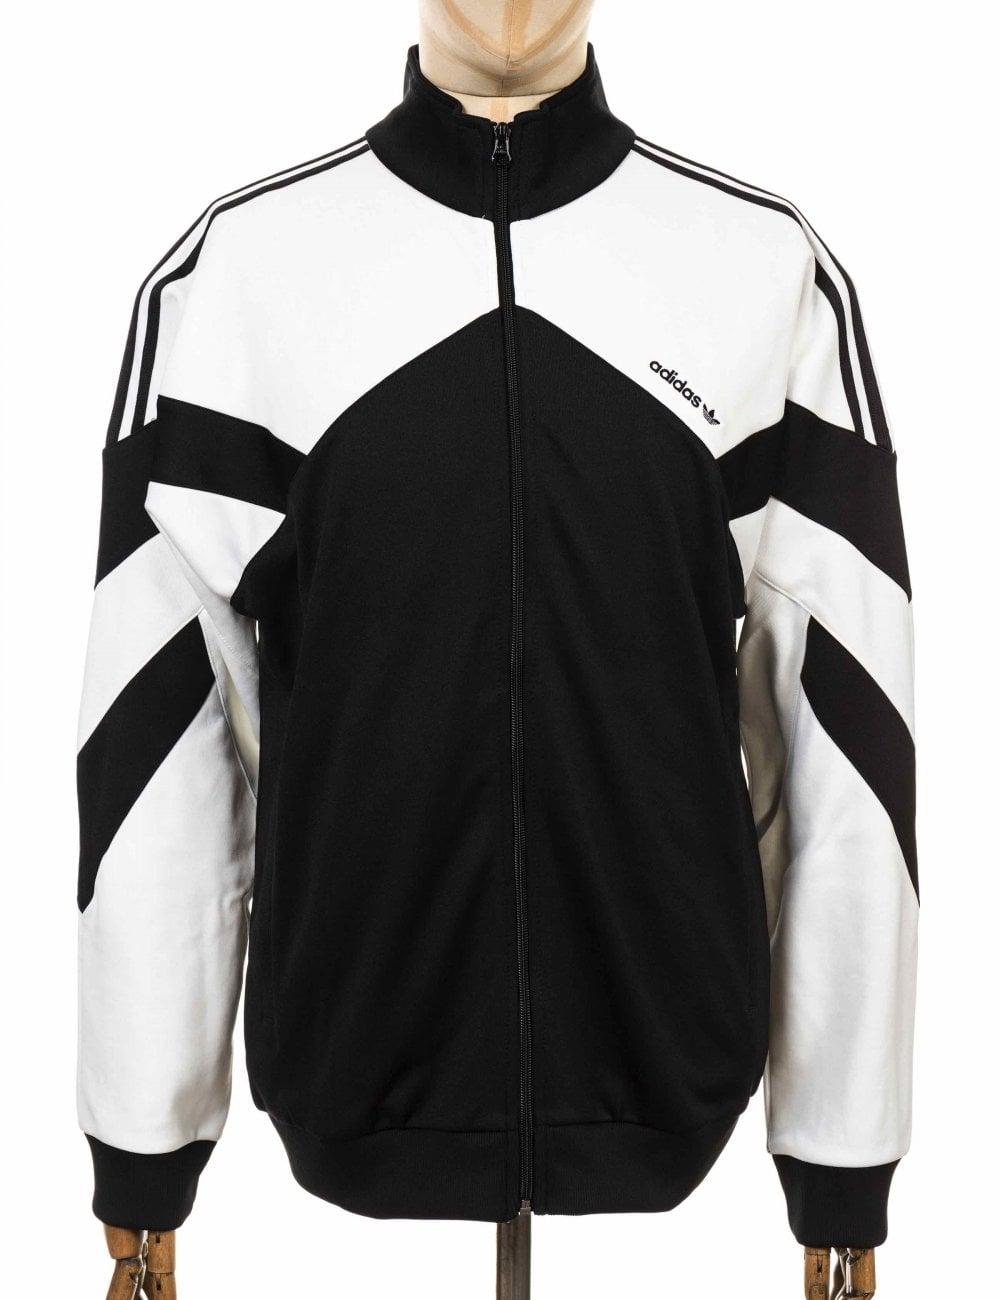 ac8465cea0 Adidas Originals Palmeston Tracktop - Black White - Jackets from Fat ...